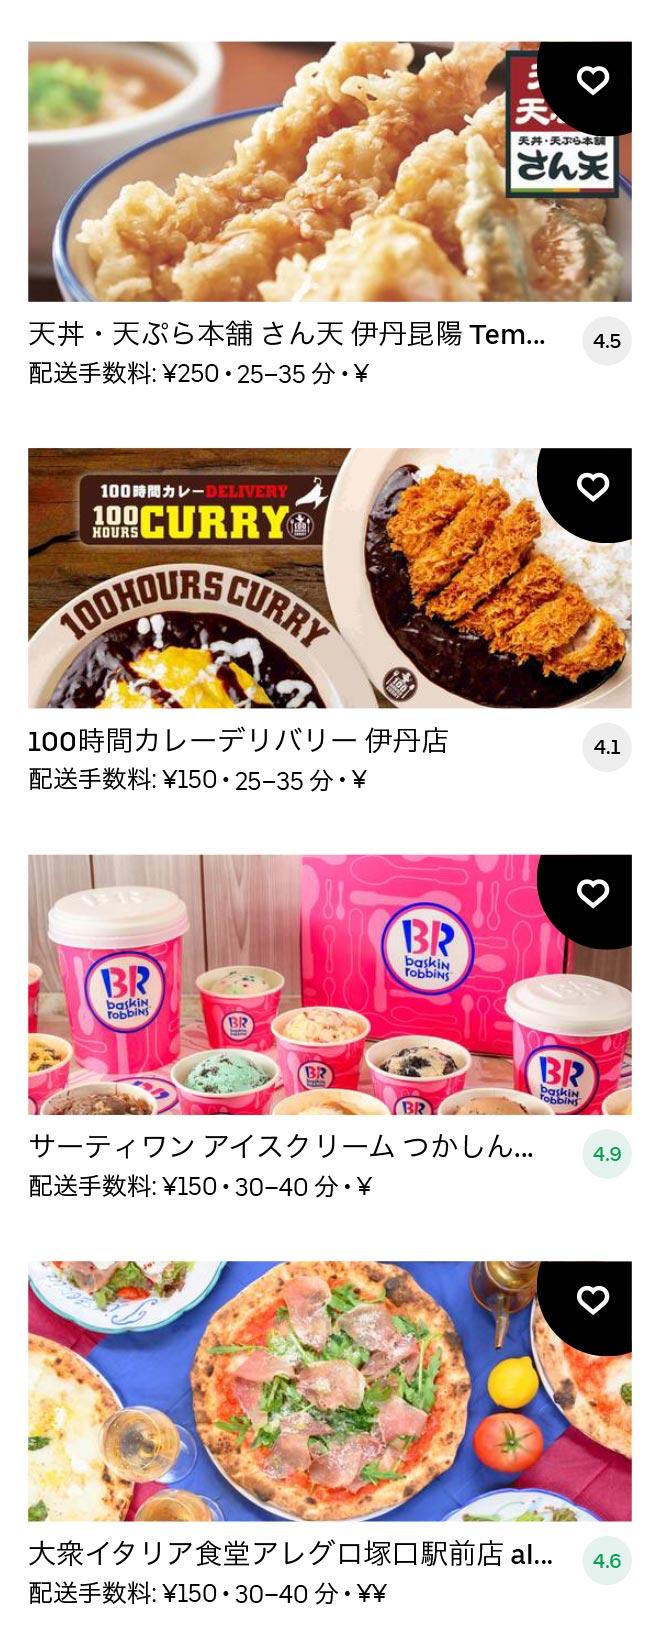 Hankyu itami menu 2011 13